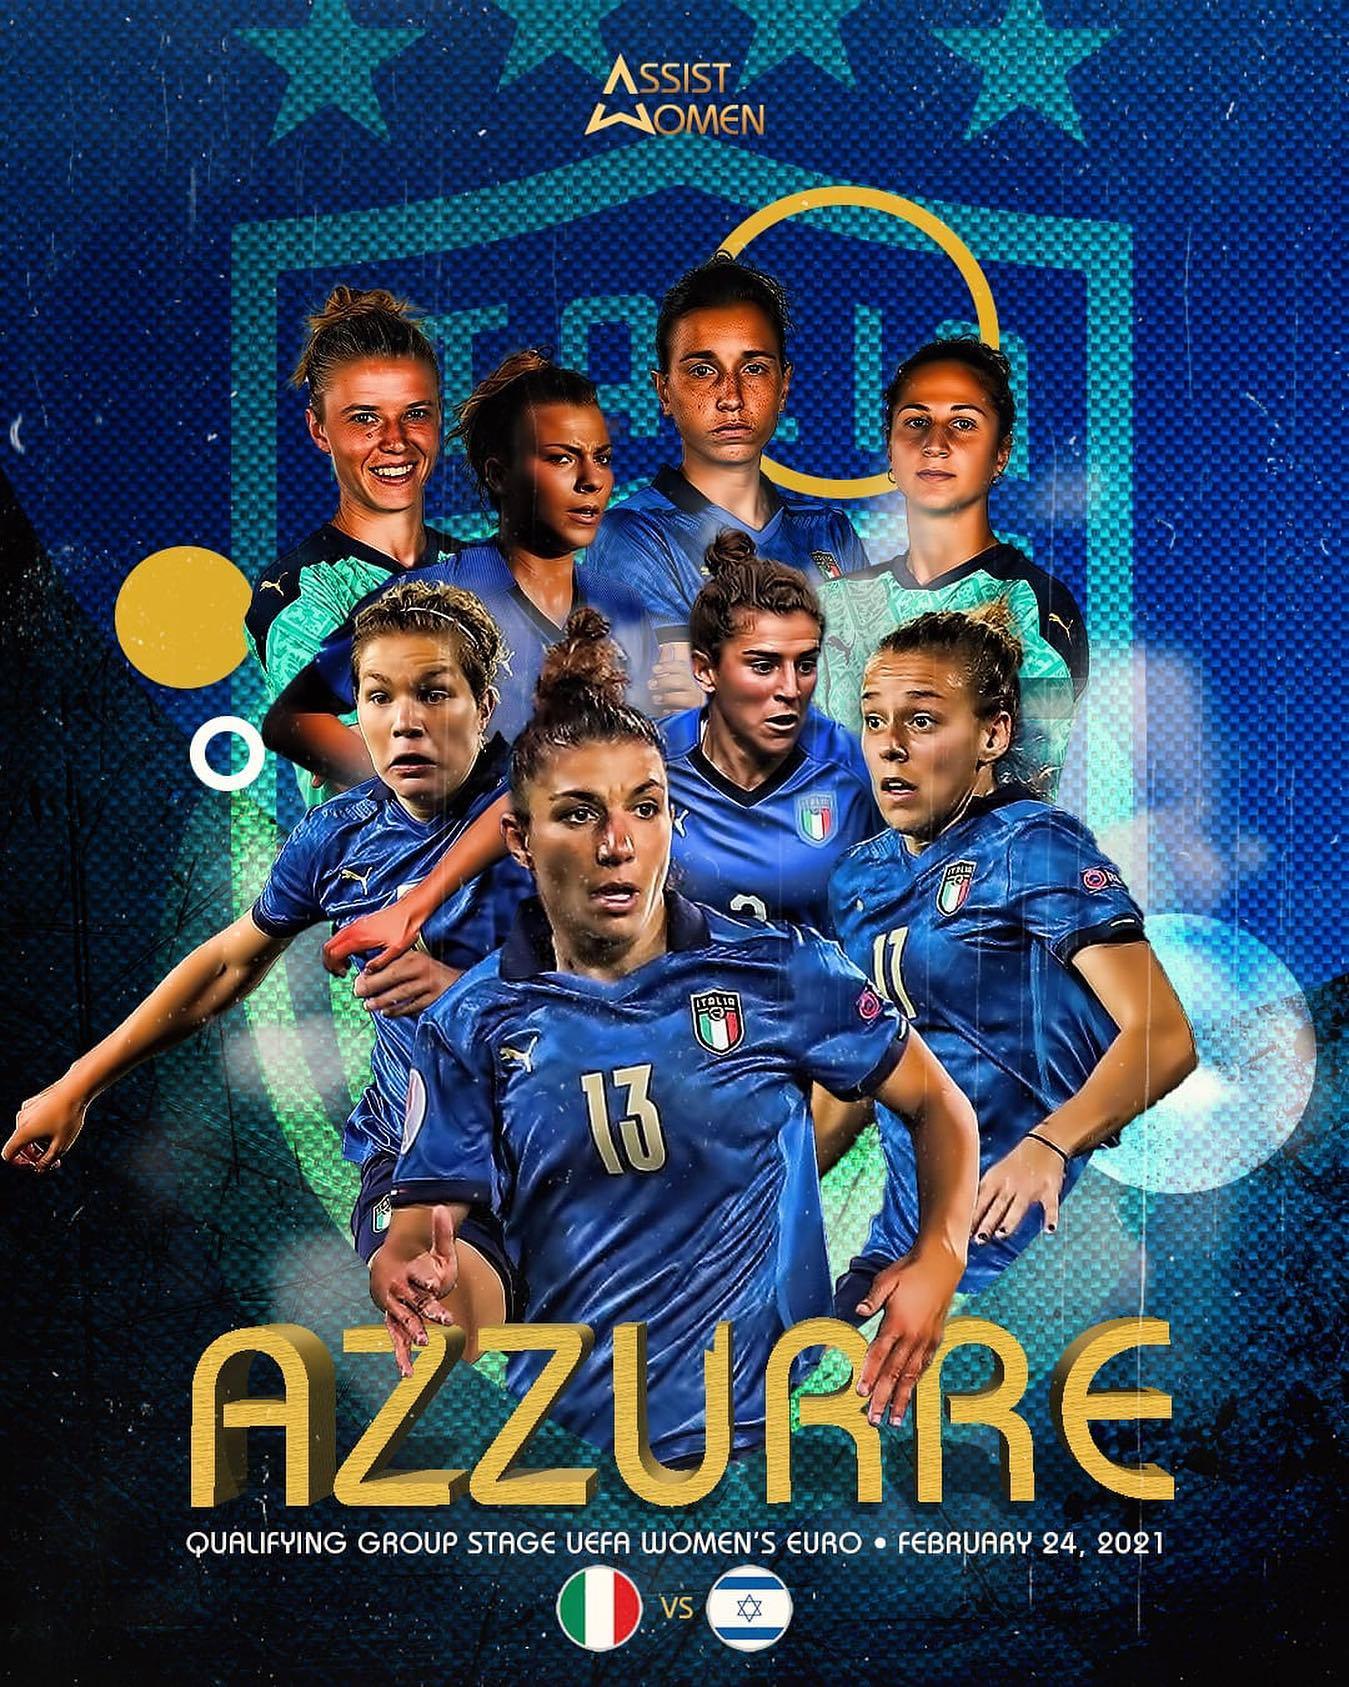 italia-israele-nazionale-femminile Nazionale femminile: 28 giocatrici convocate dal ct Bartolini per Italia-Israele